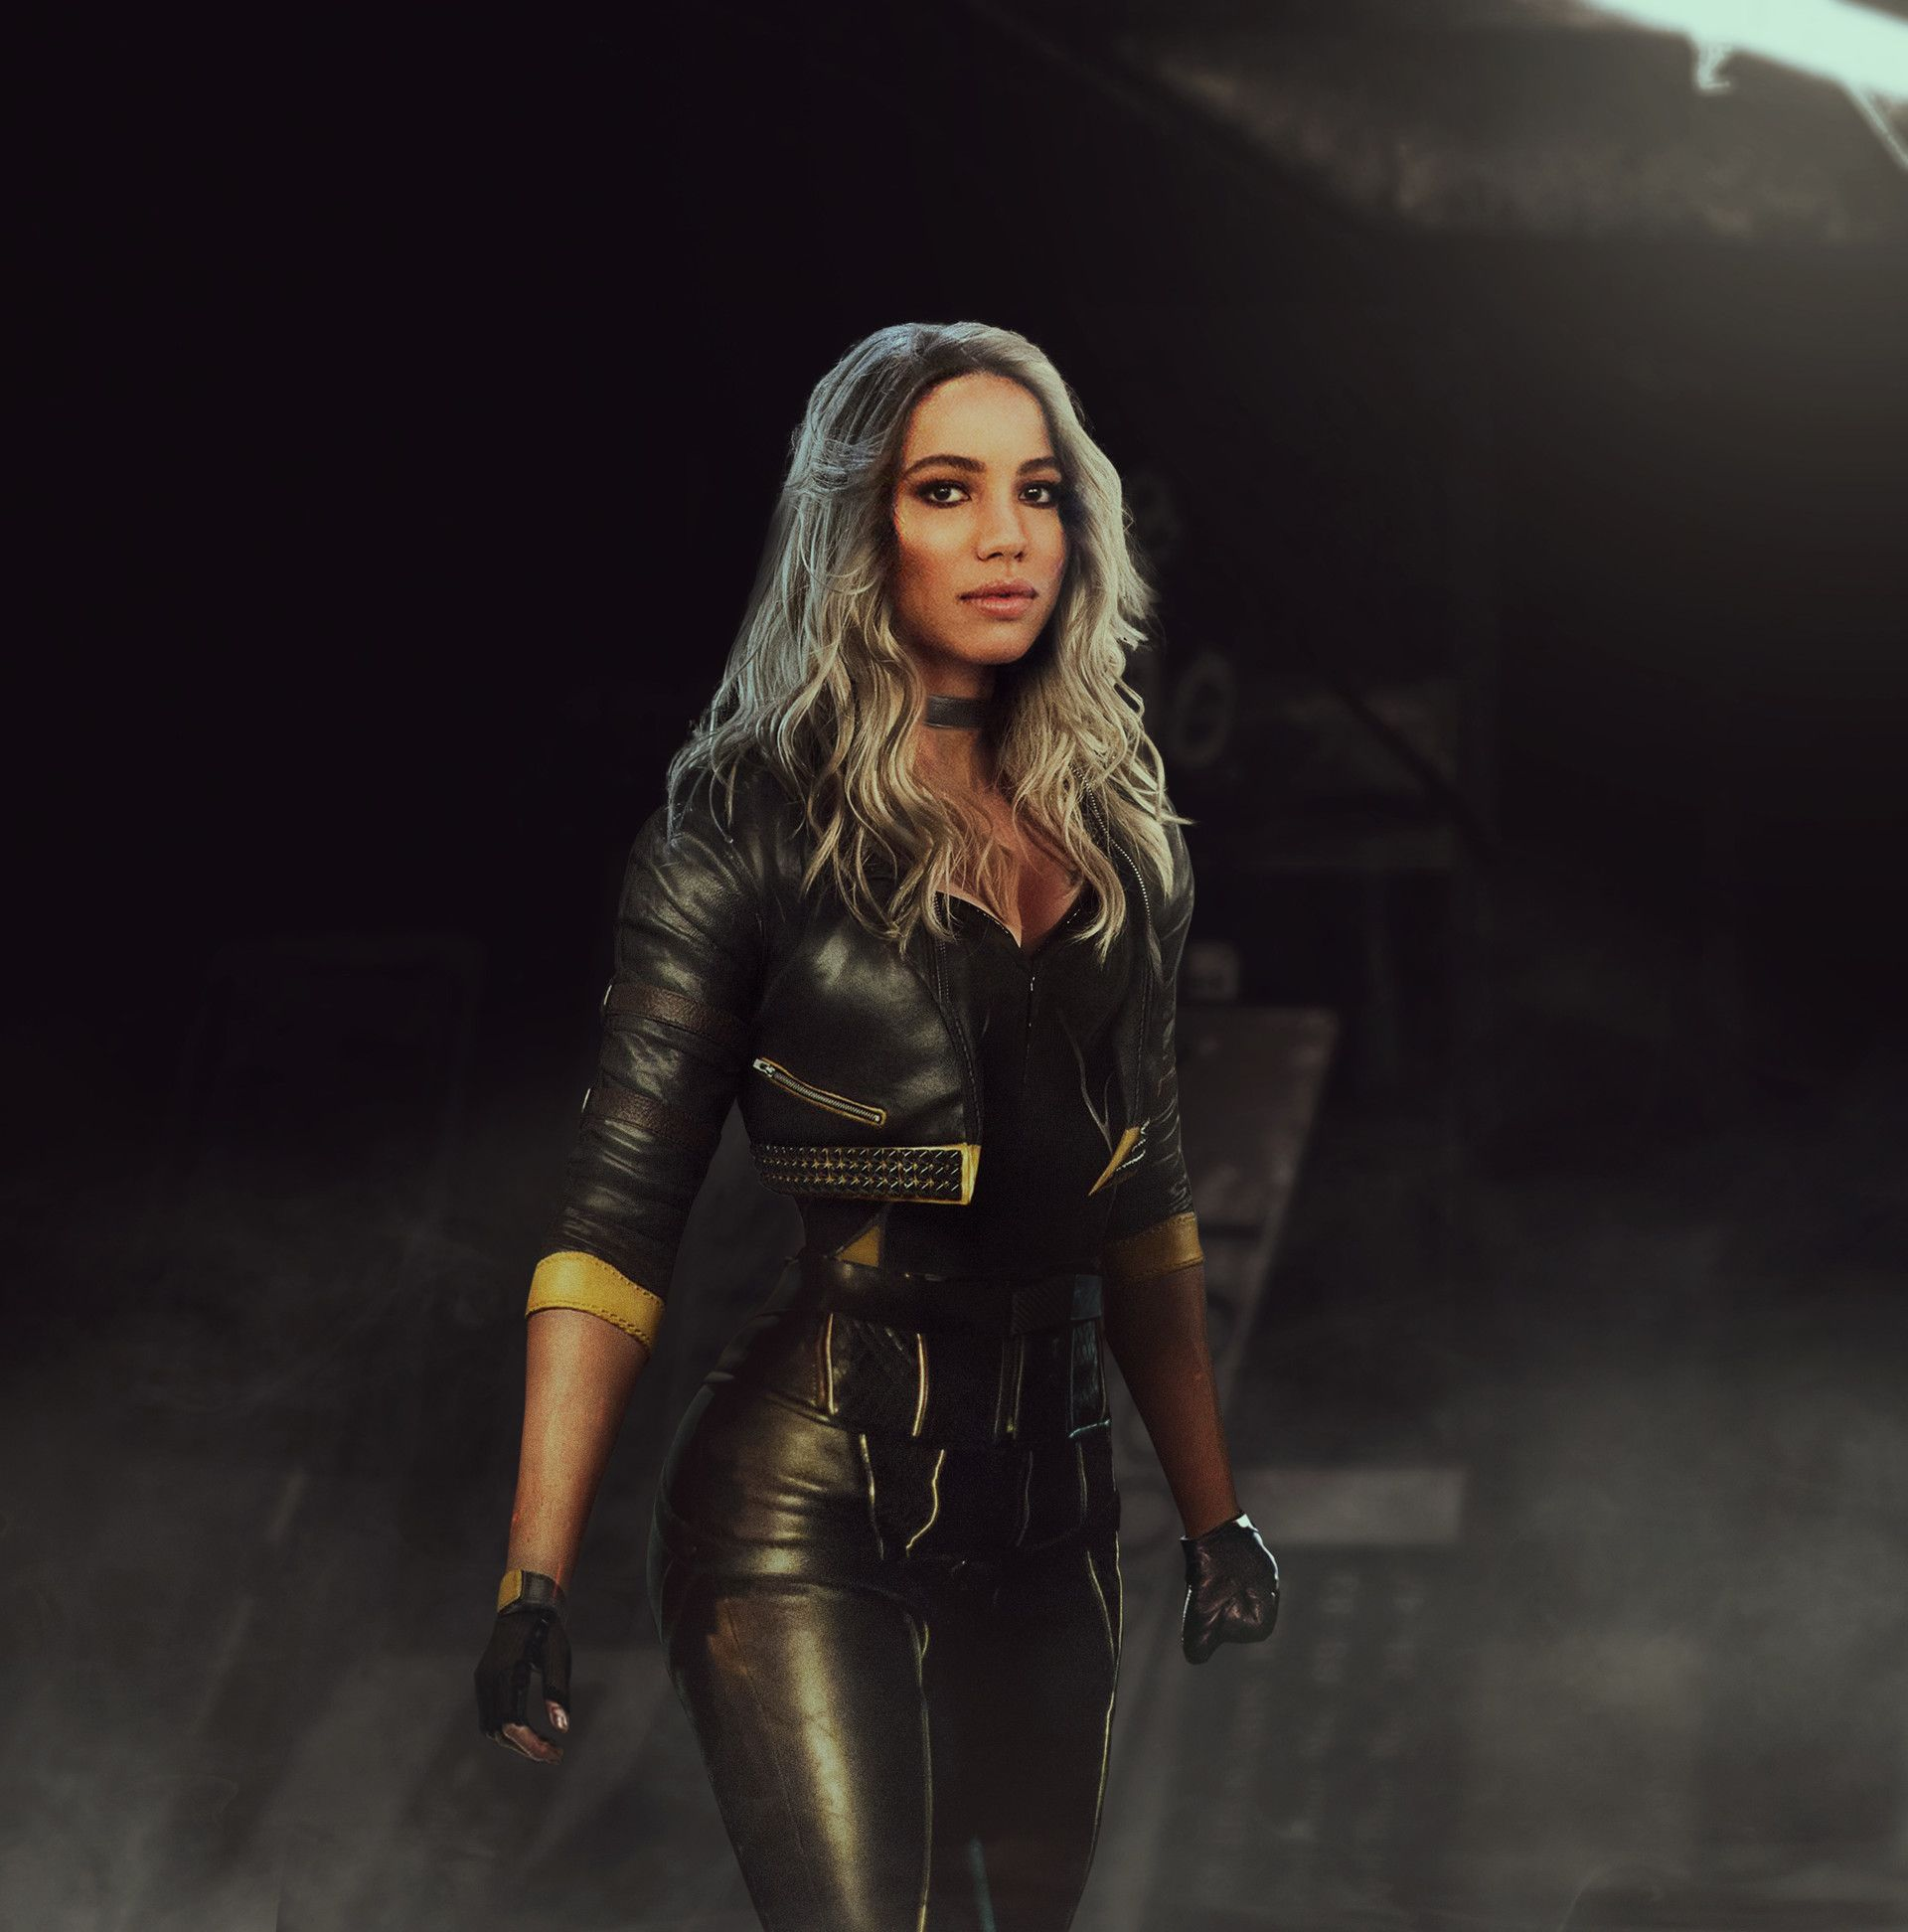 Black Canary Jurnee Smollett Bell I M So Ready For A Bop Movie Lets Go She Looks Like She S Gonna Be Such Black Canary Costume Black Canary Jurnee Smollett